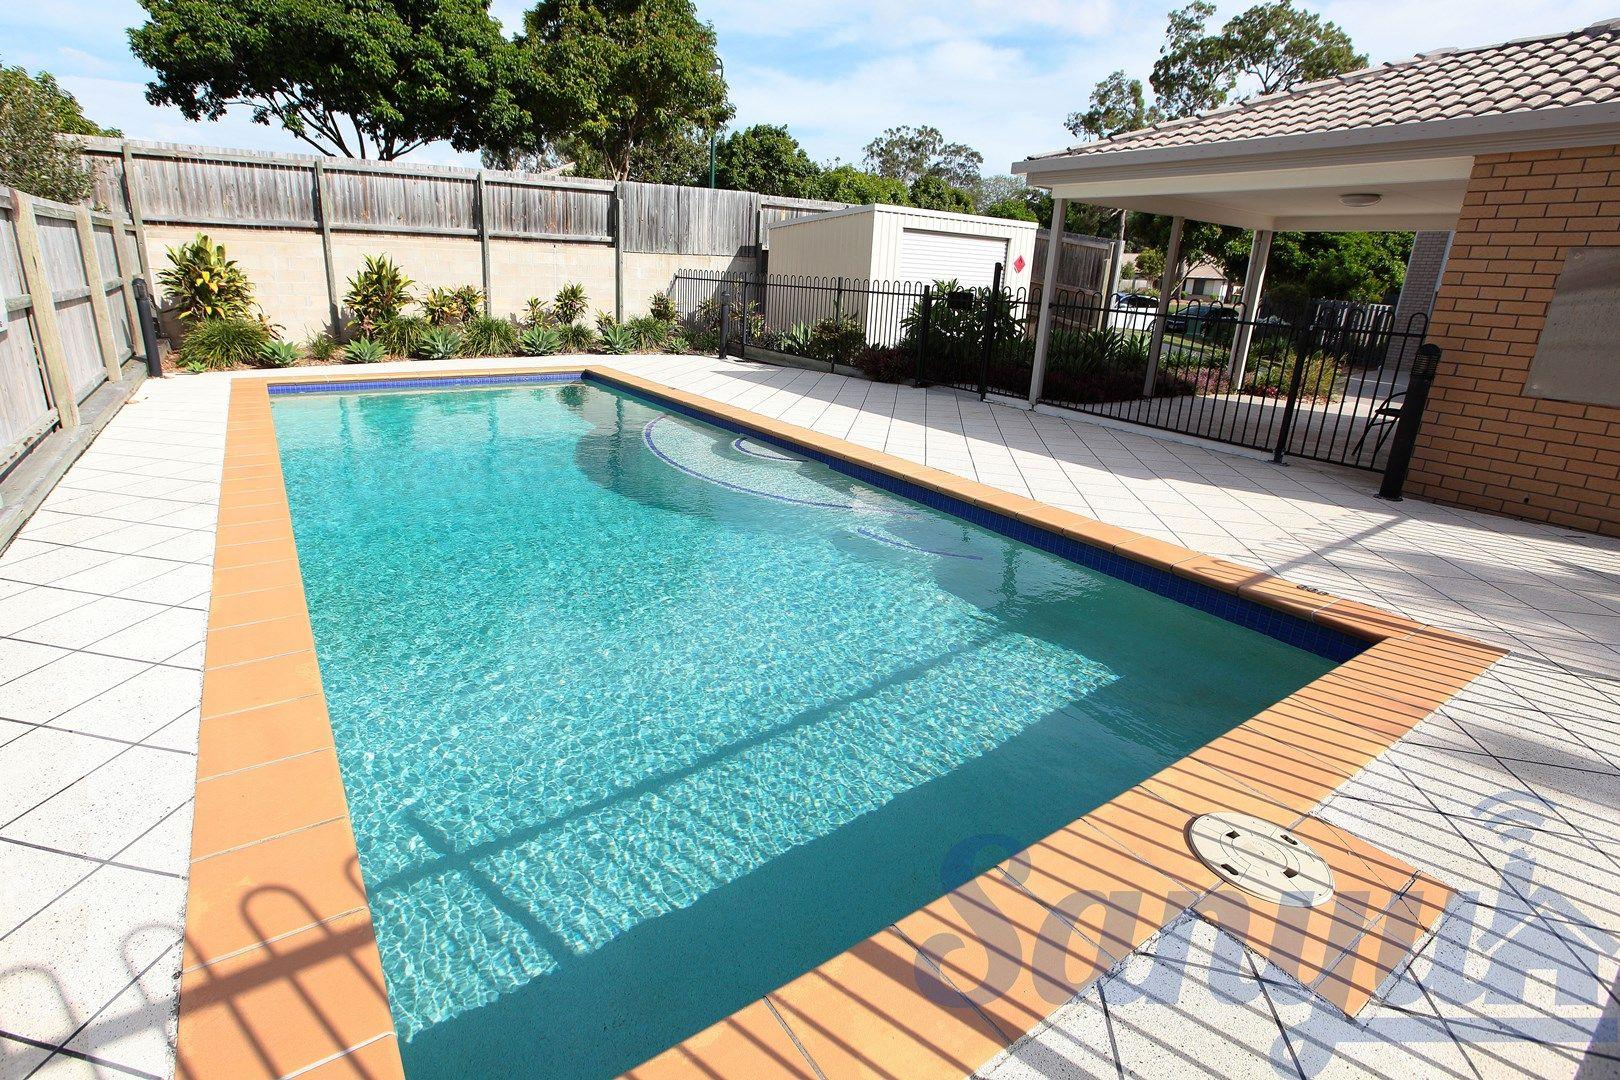 35/46 Hamish Street, Calamvale QLD 4116, Image 0